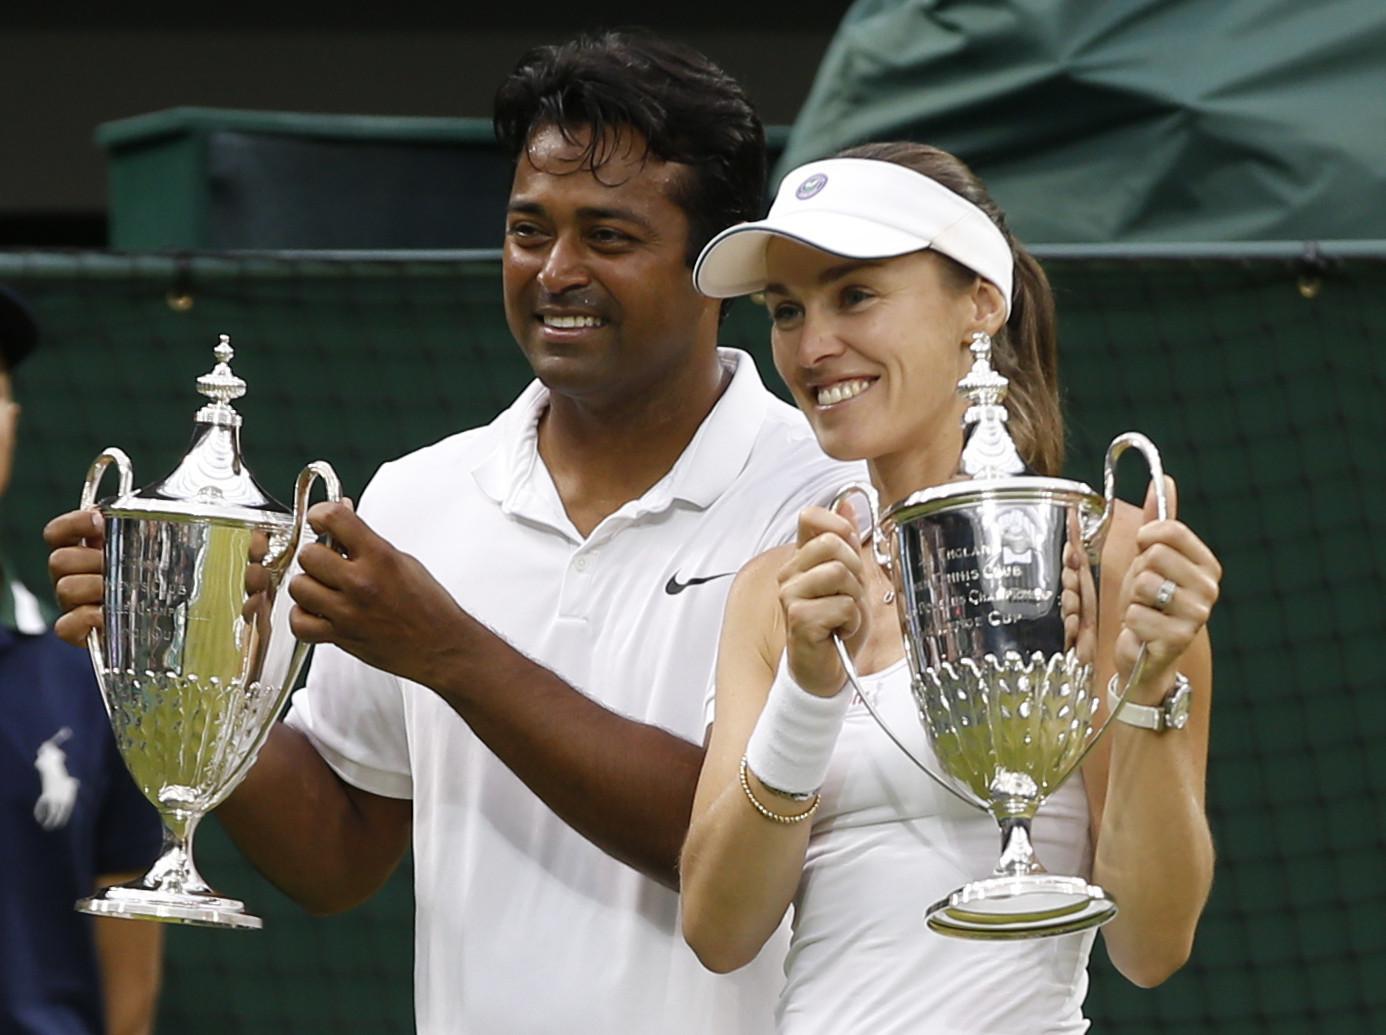 Martina Hingis wins Wimbledon mixed doubles for 2 titles in 2 days